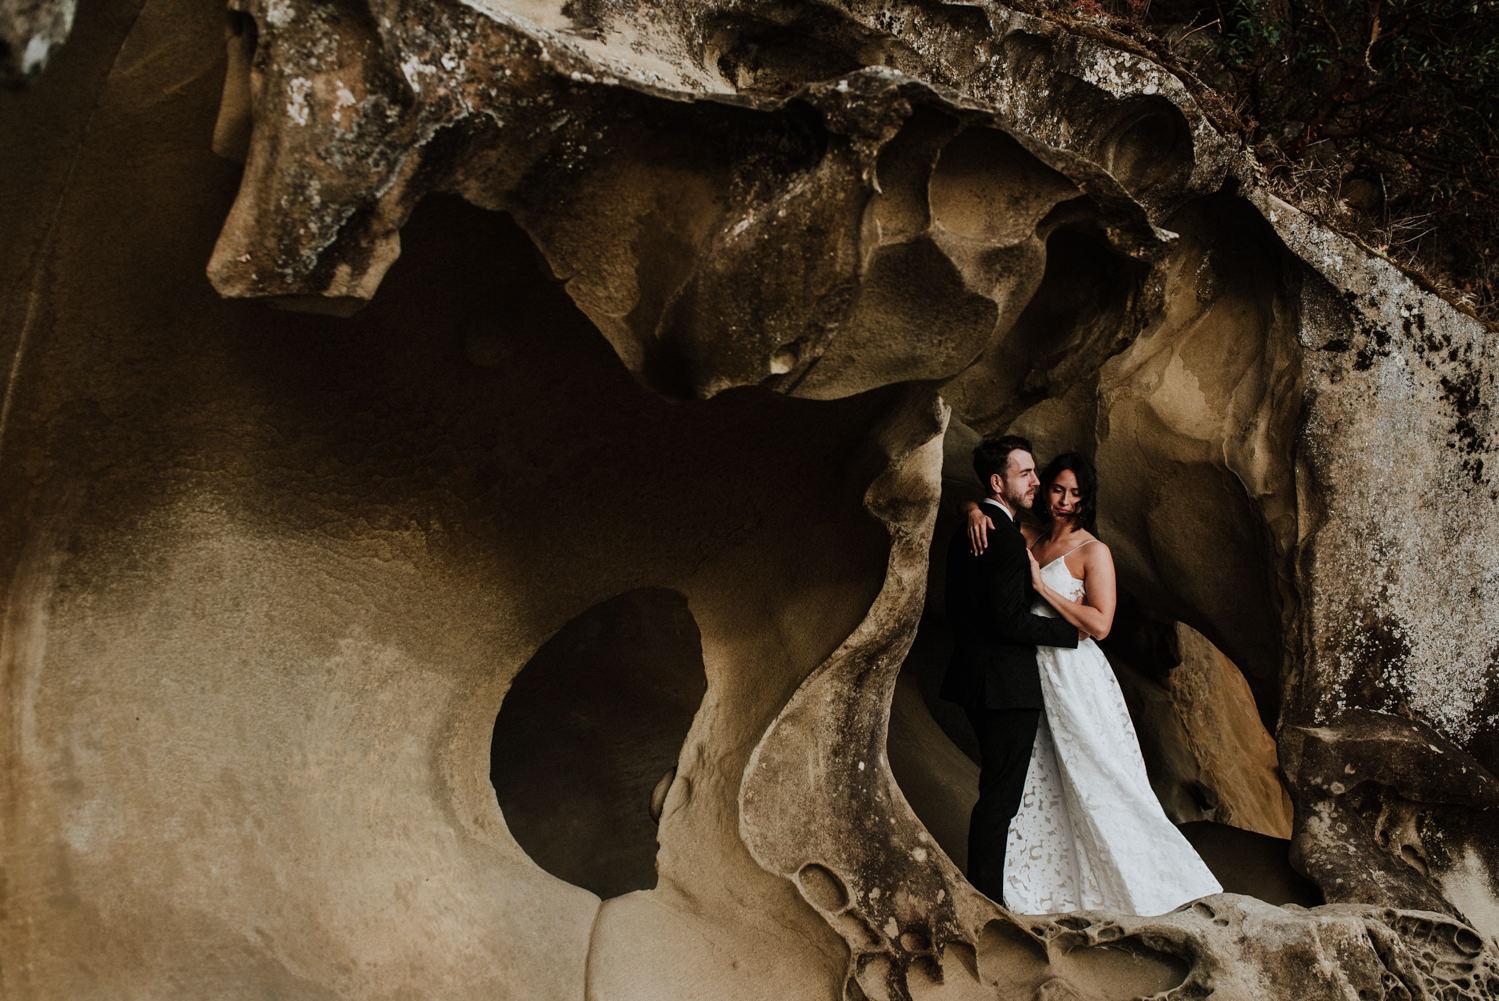 wedding at Bodega Ridge, wedding on Galiano Island BC, BC wedding photographer, Gulf Island wedding photographer, bride and groom in cave